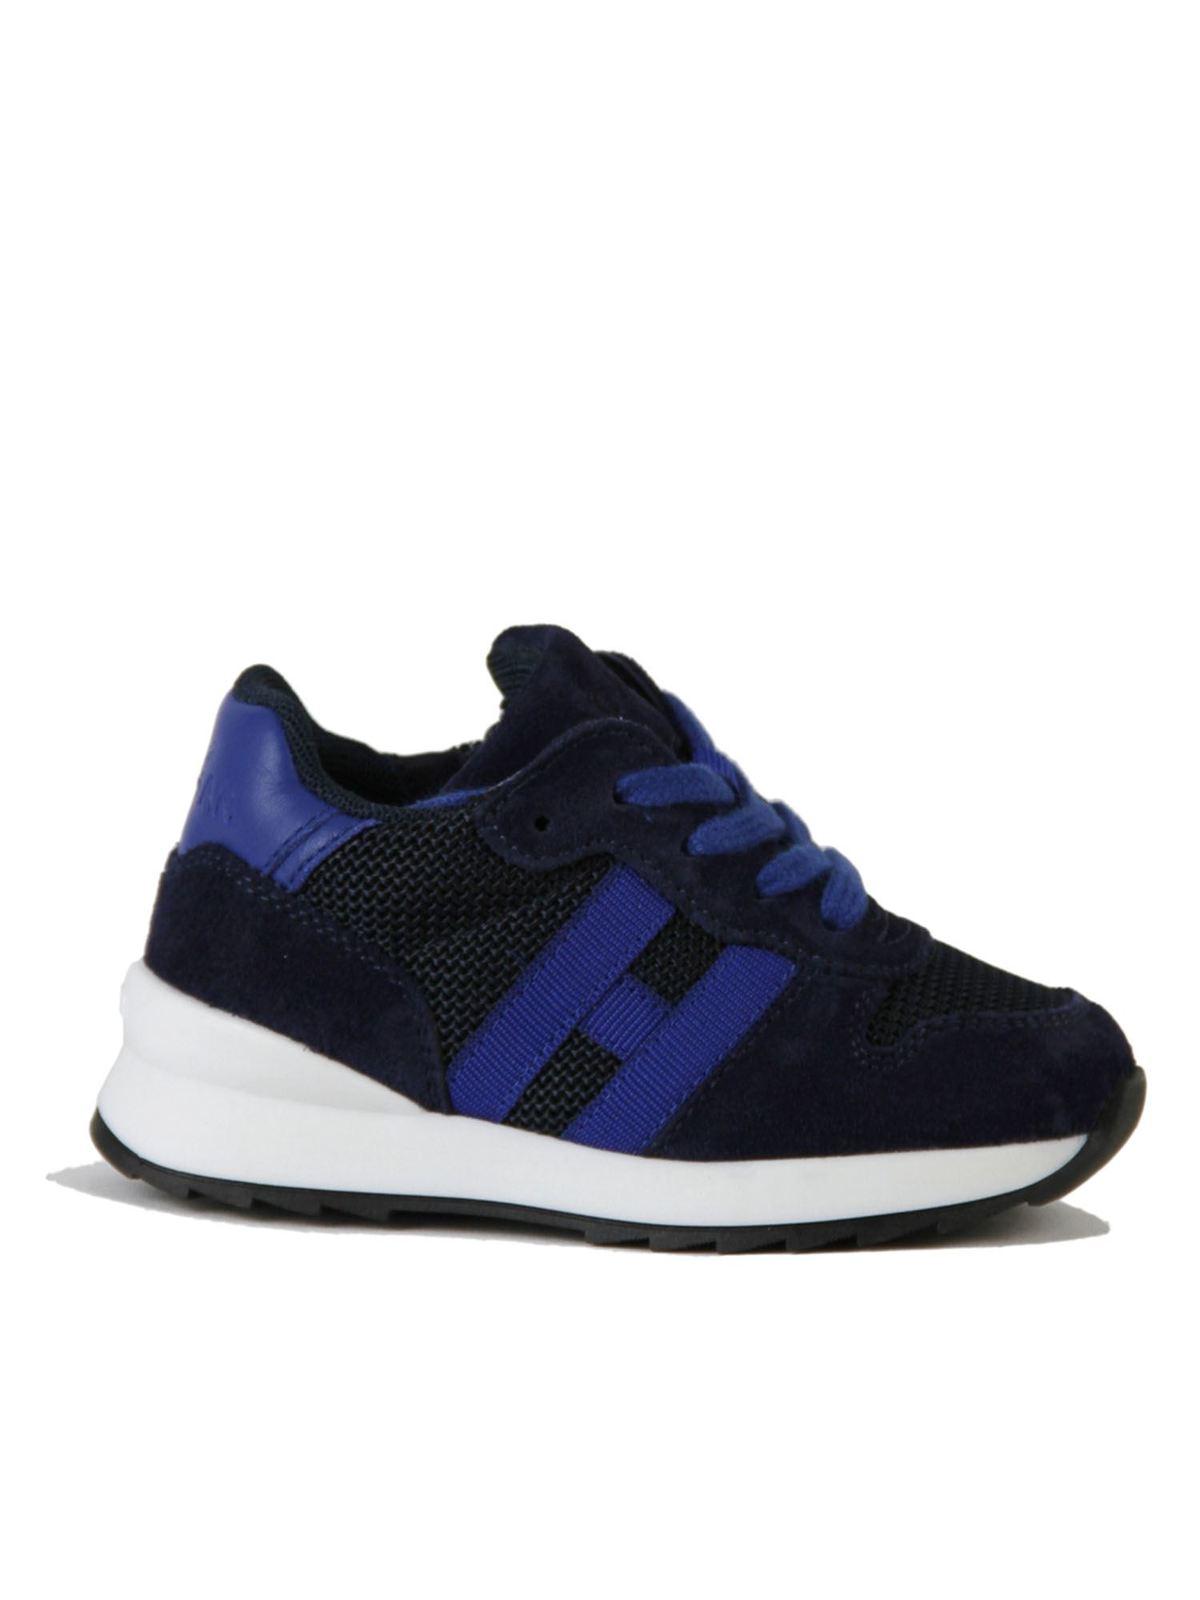 HOGAN RUNNING SNEAKERS R261 FIRST STEPS IN BLUE